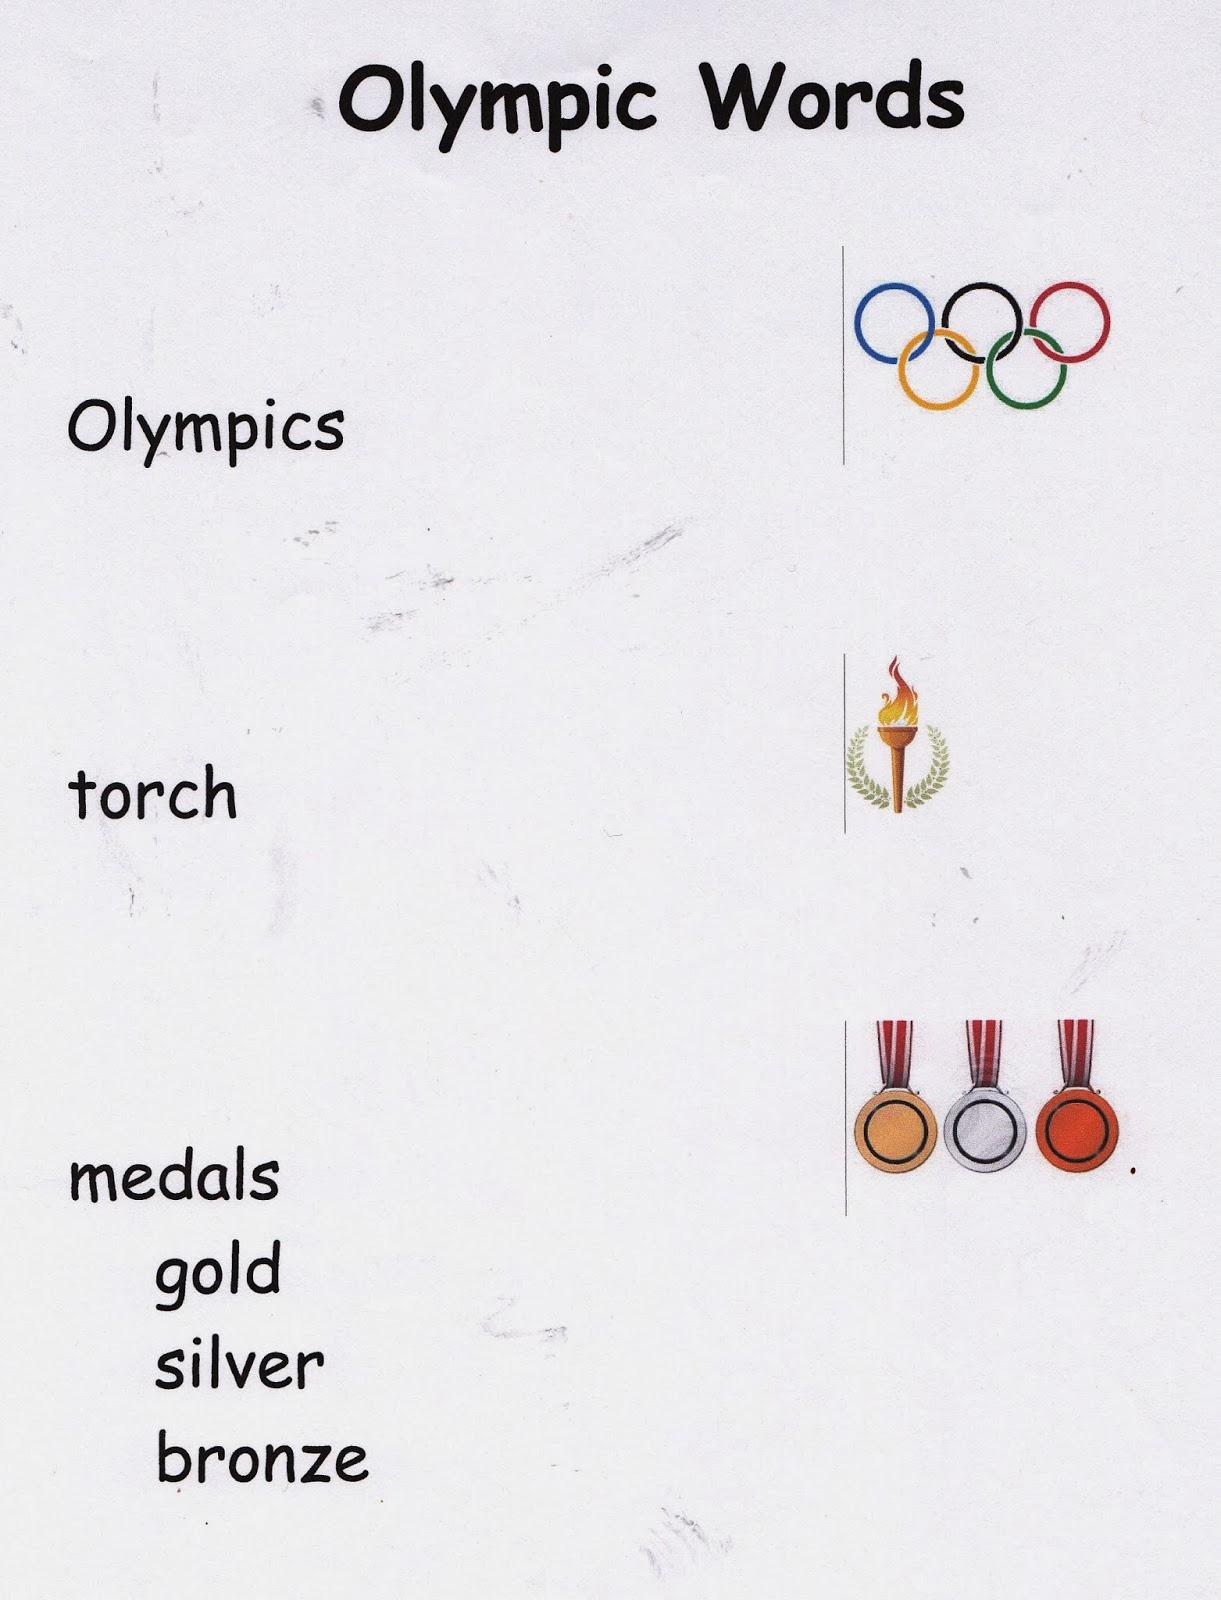 Metamora Community Preschool: Winter Olympics---words and